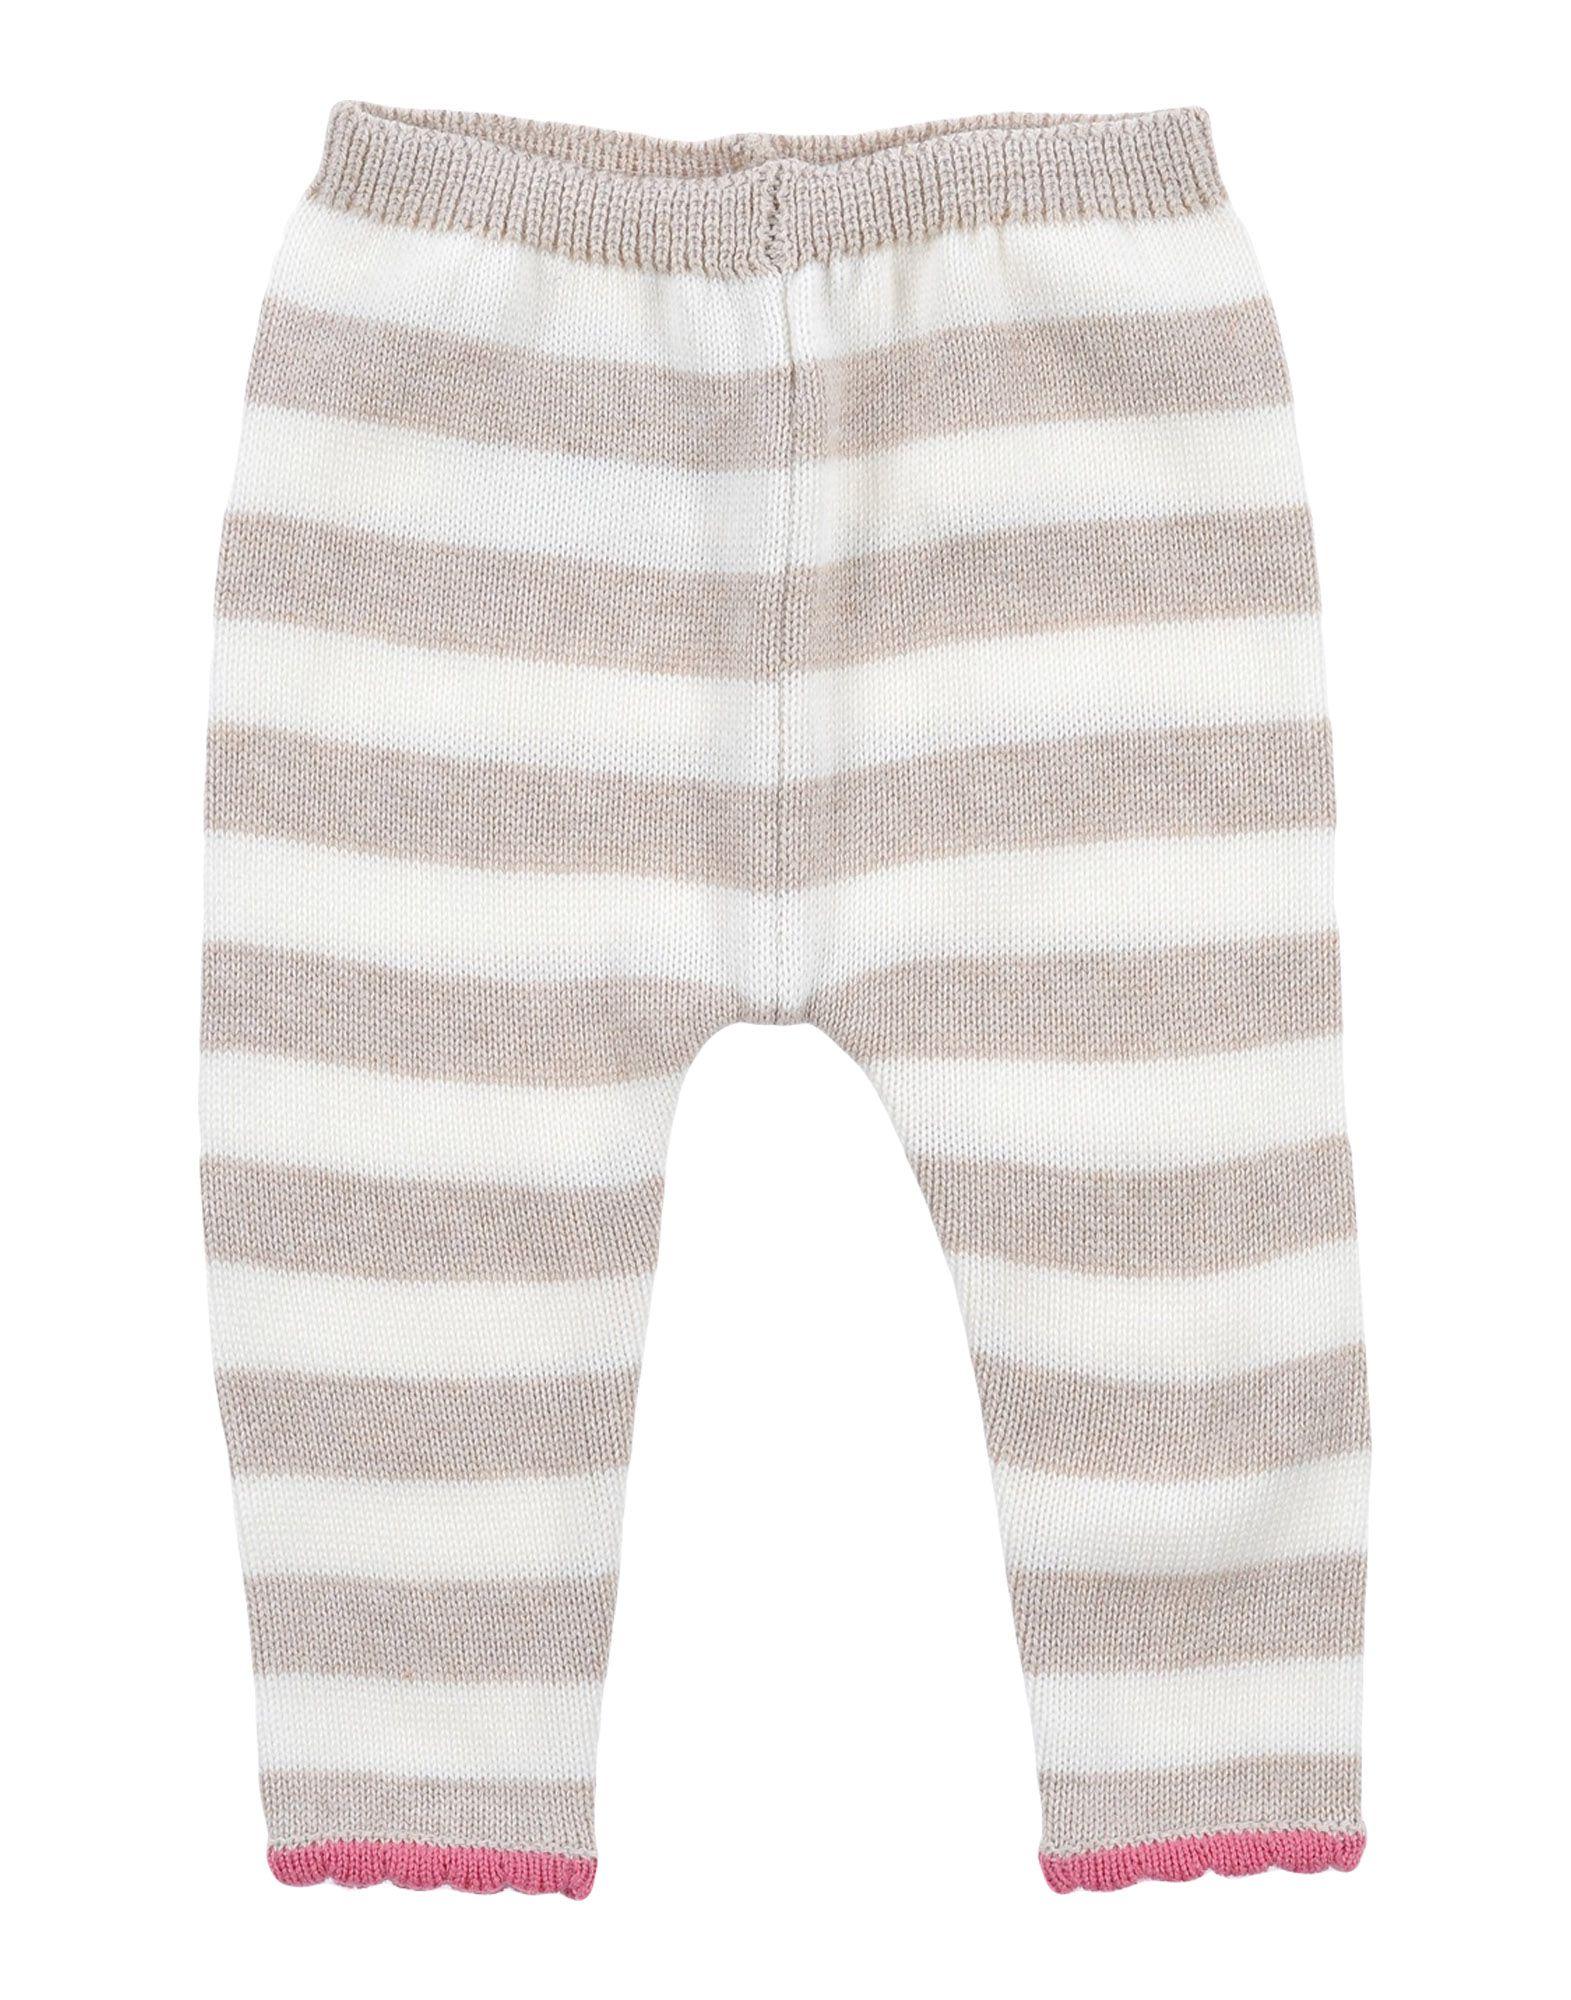 MAYORAL Casual Pants in Beige